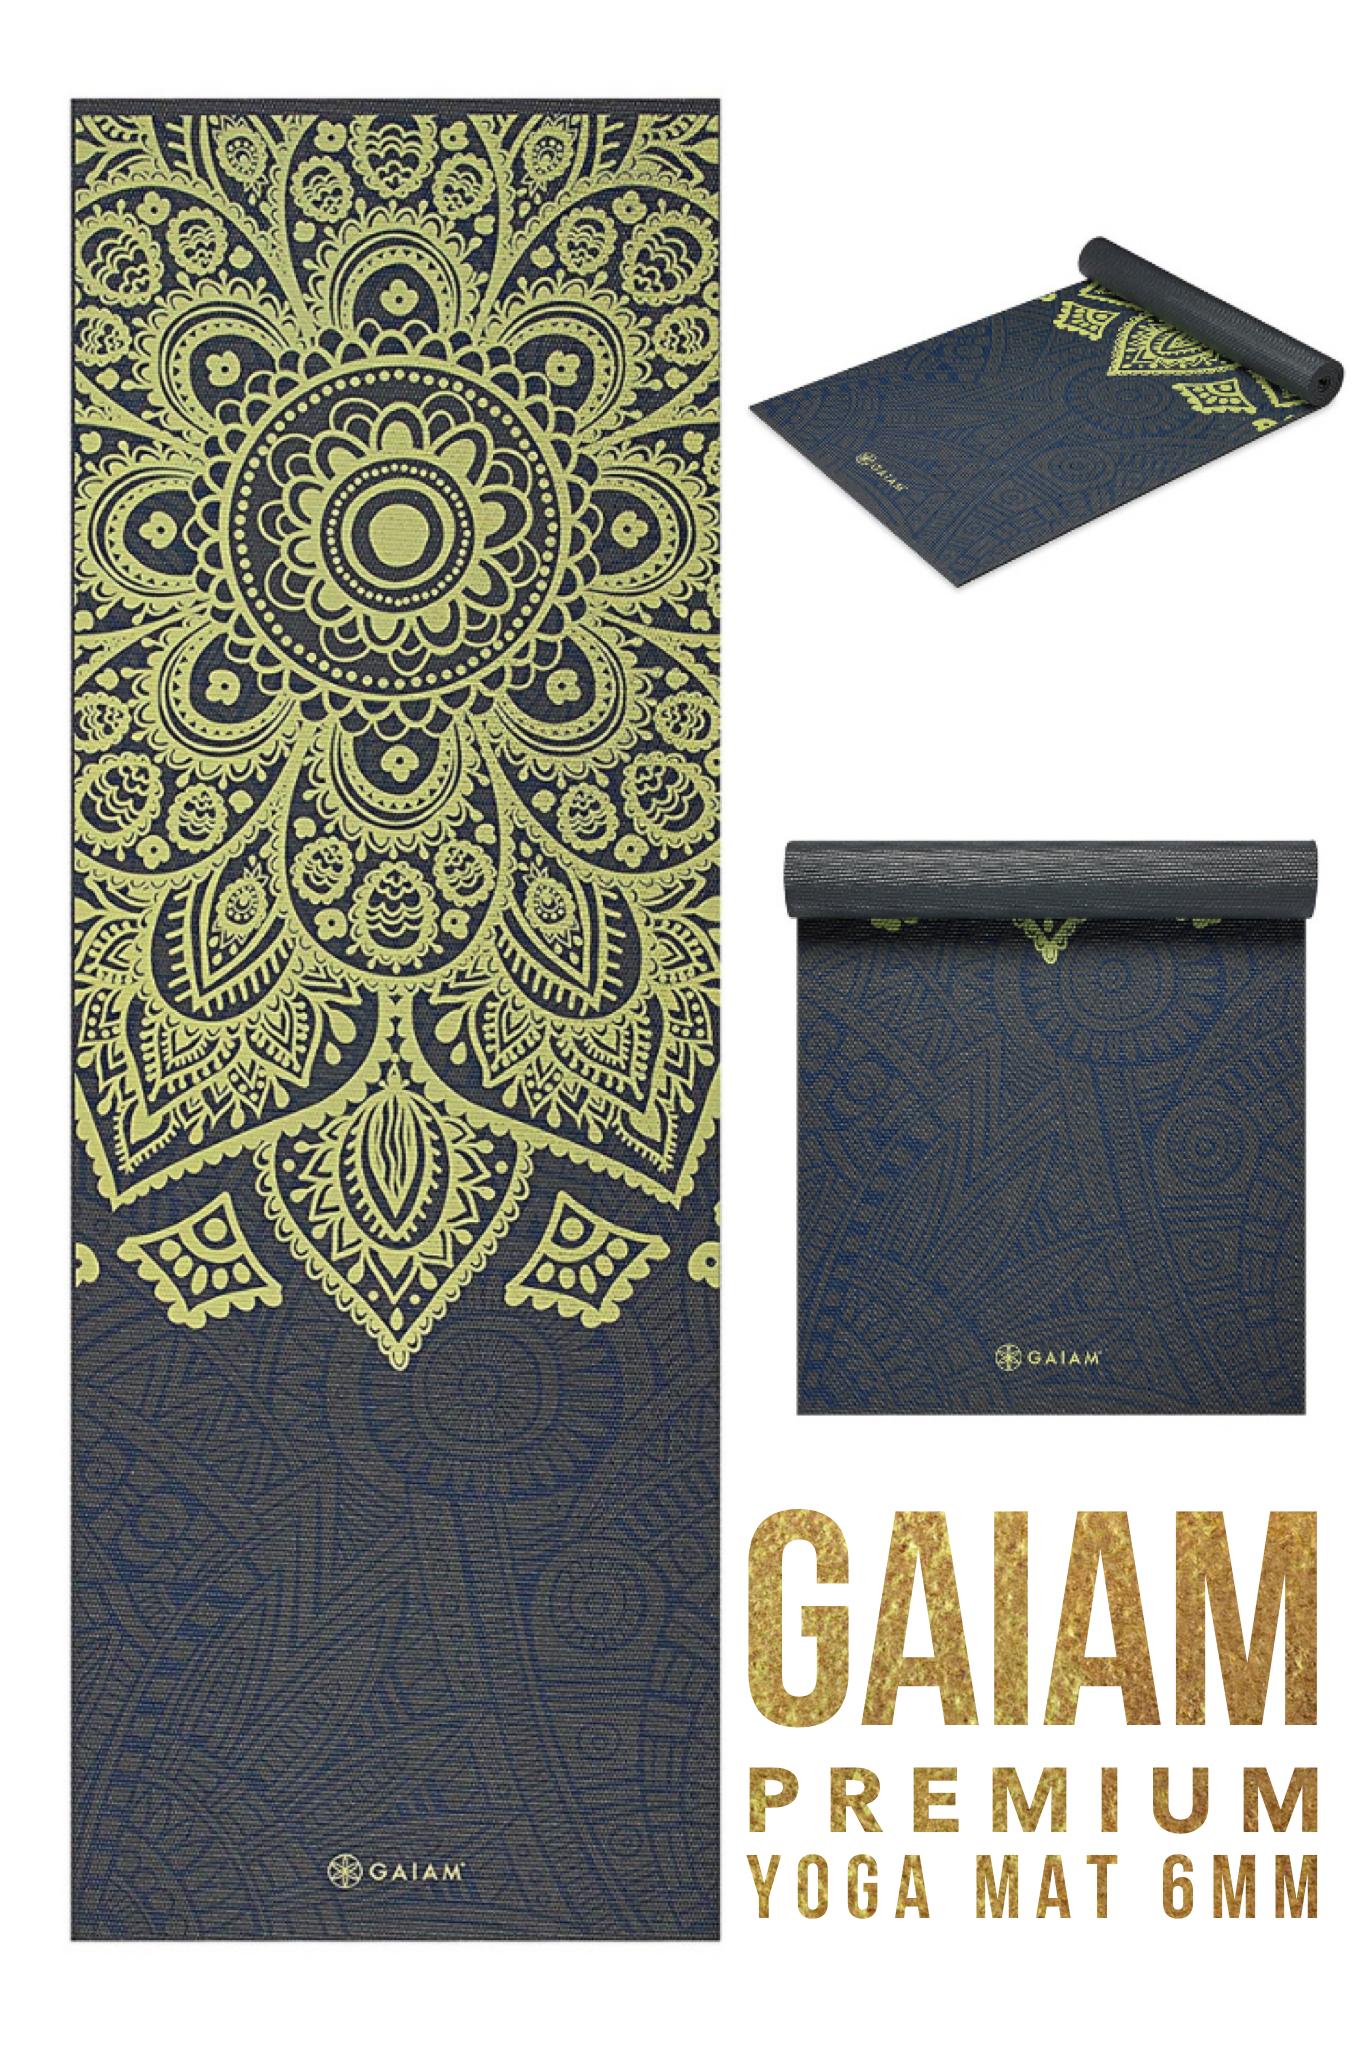 Premium Yoga Mat 6mm Gaiam Yoga Mat Floor Workouts Travel Workout